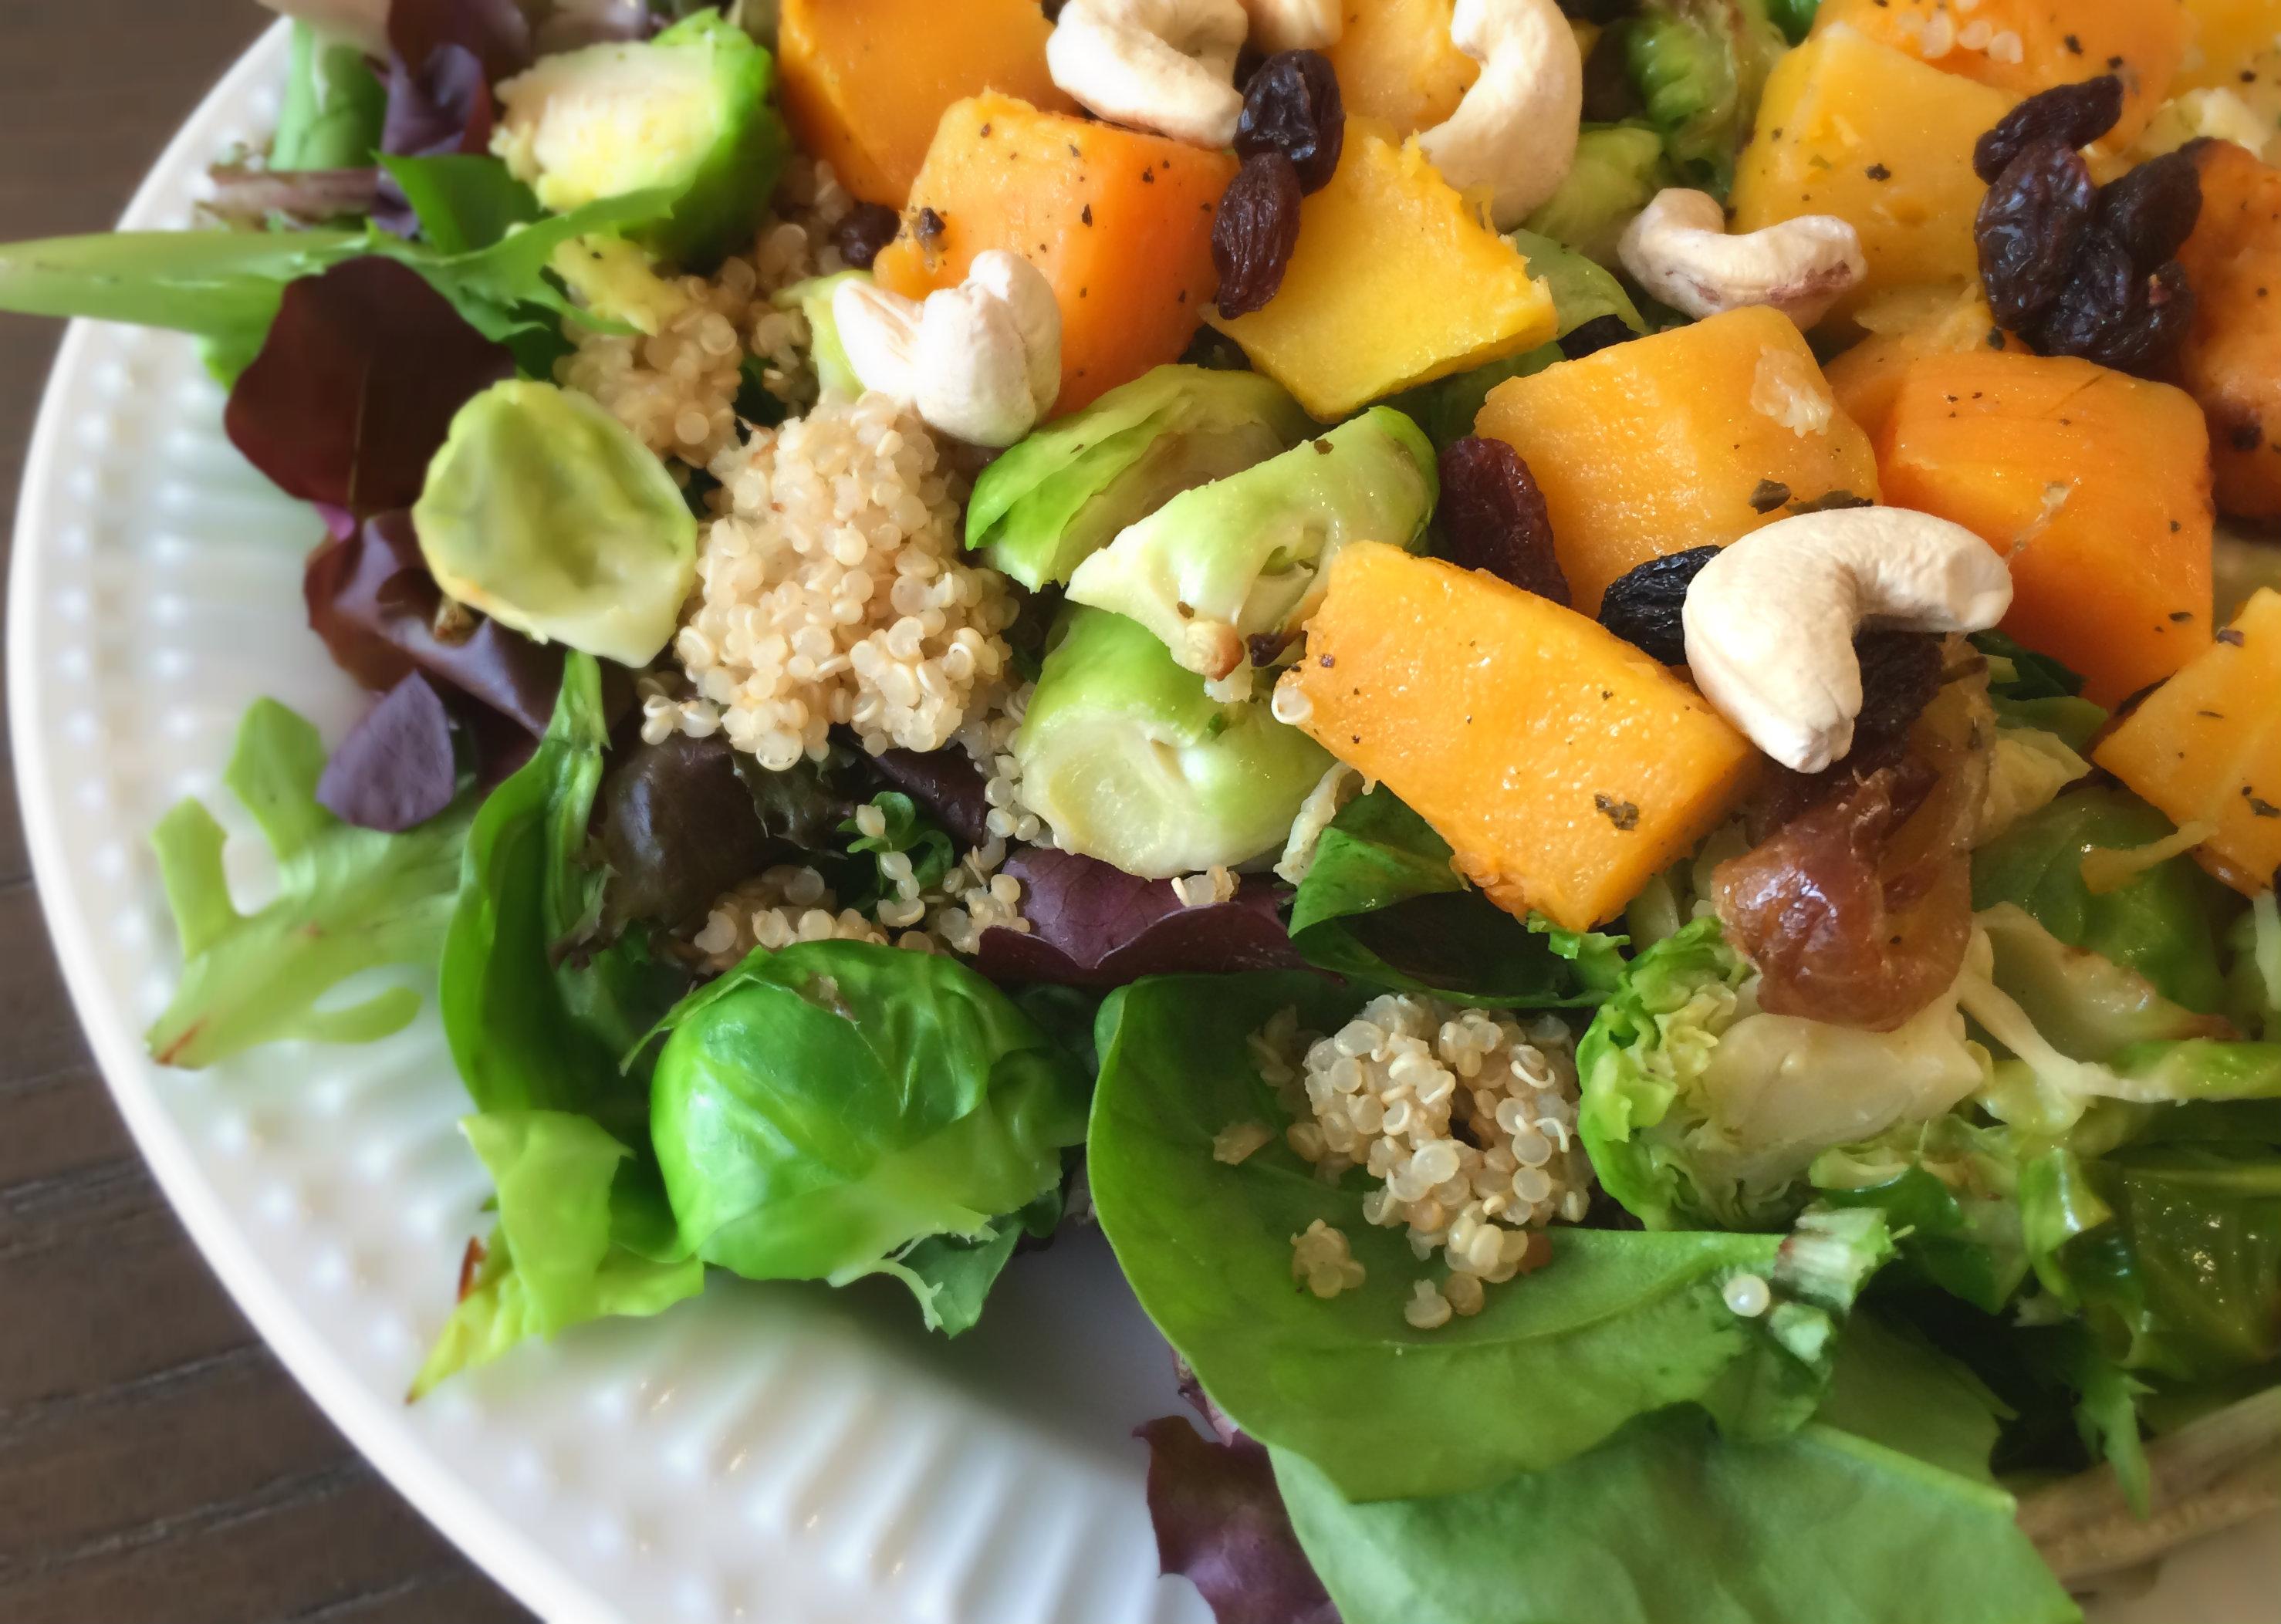 Fall salad - nesting story